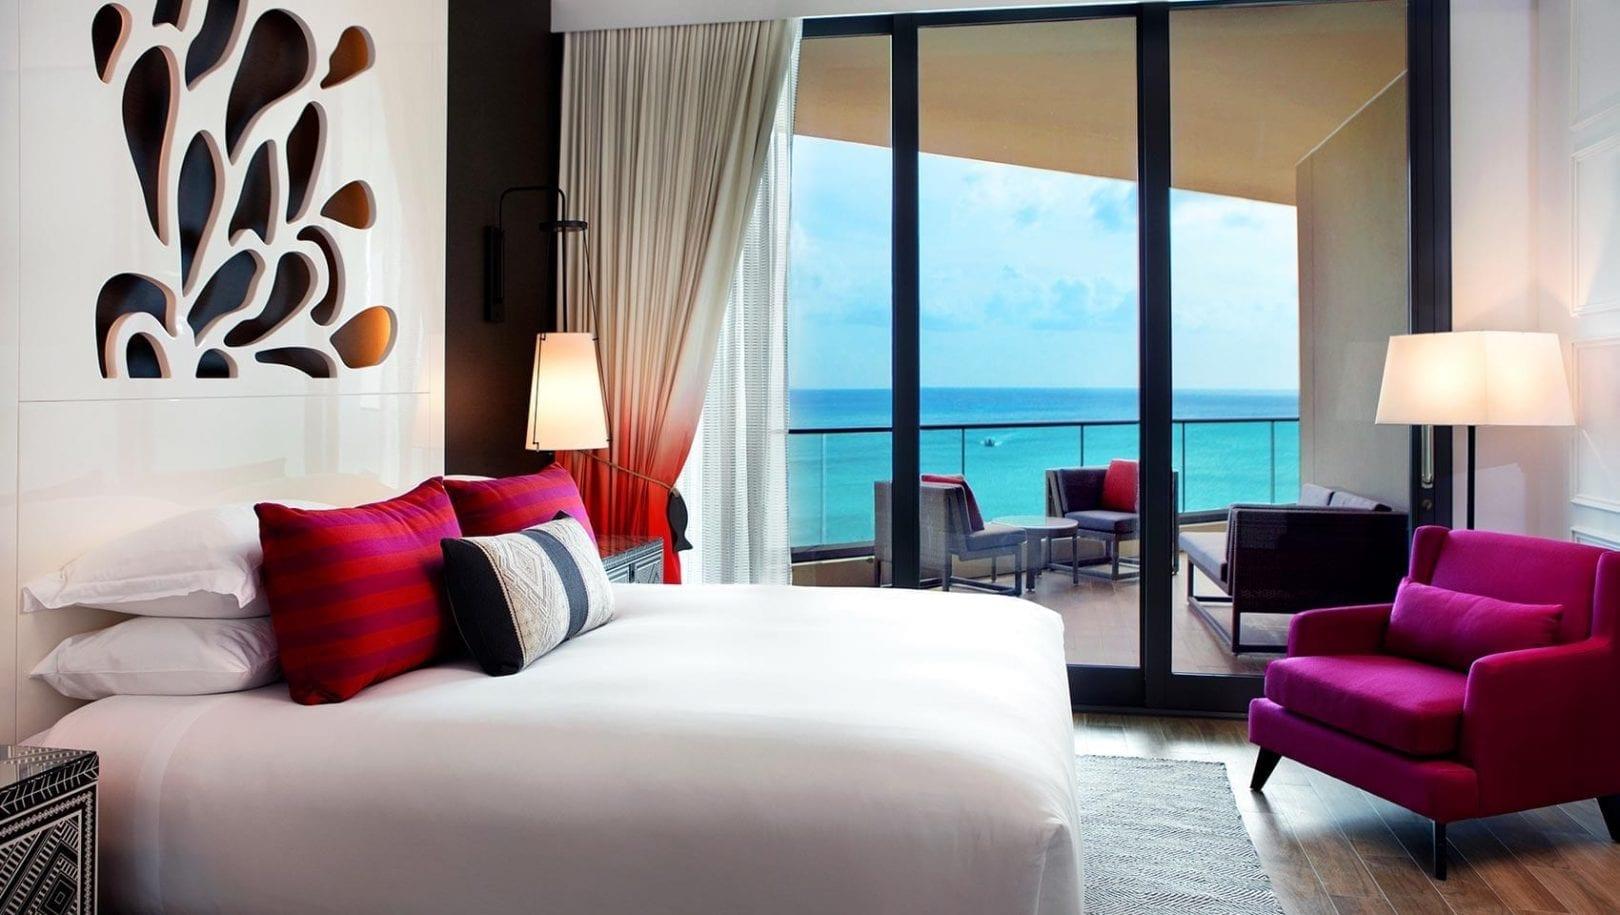 Seafire Resort + Spa Cayman Islands